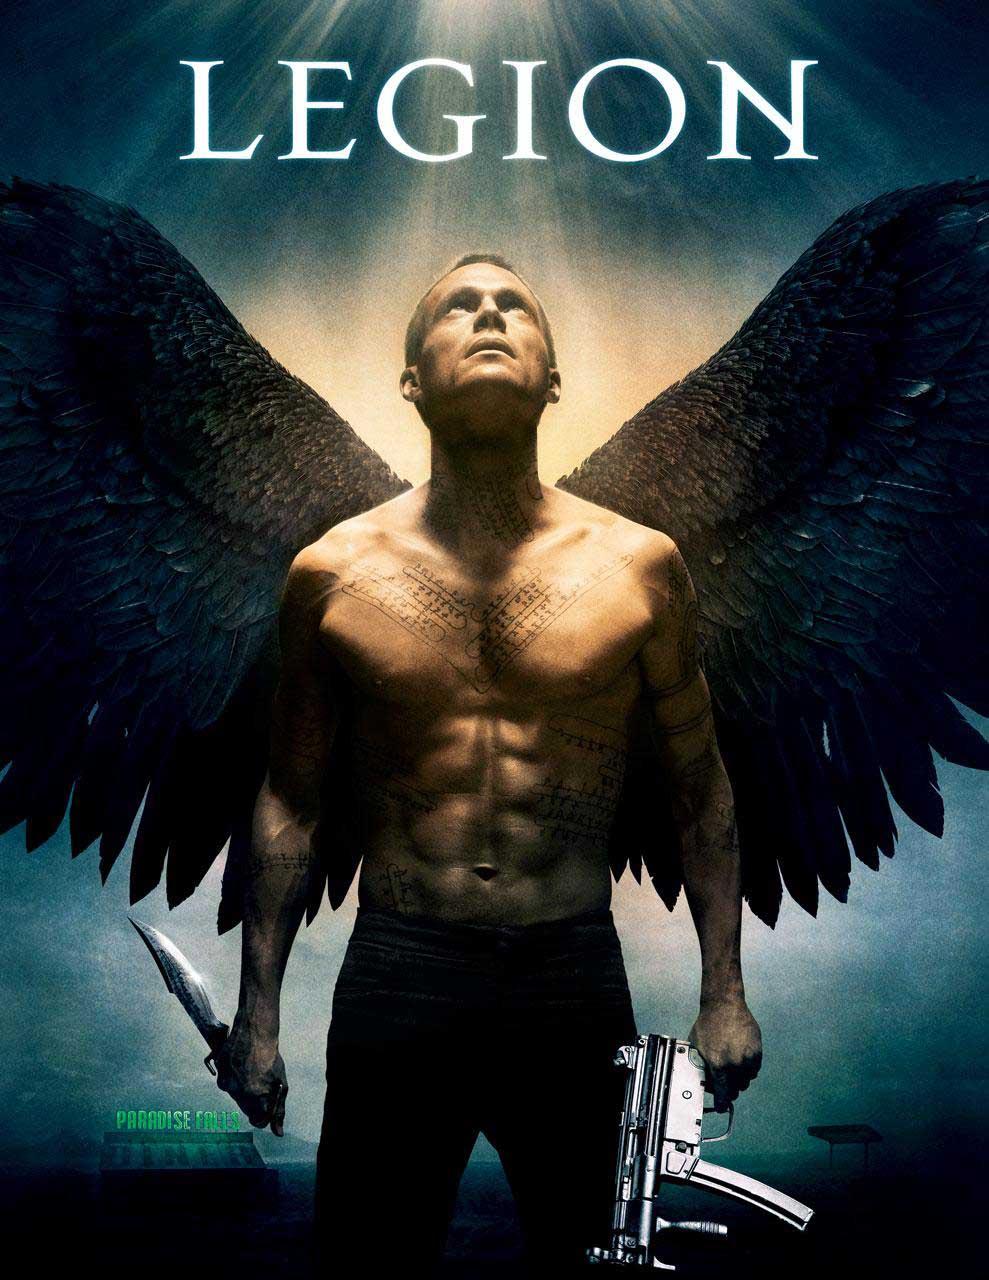 https://i0.wp.com/www.filmofilia.com/wp-content/uploads/2009/07/legion_poster.jpg